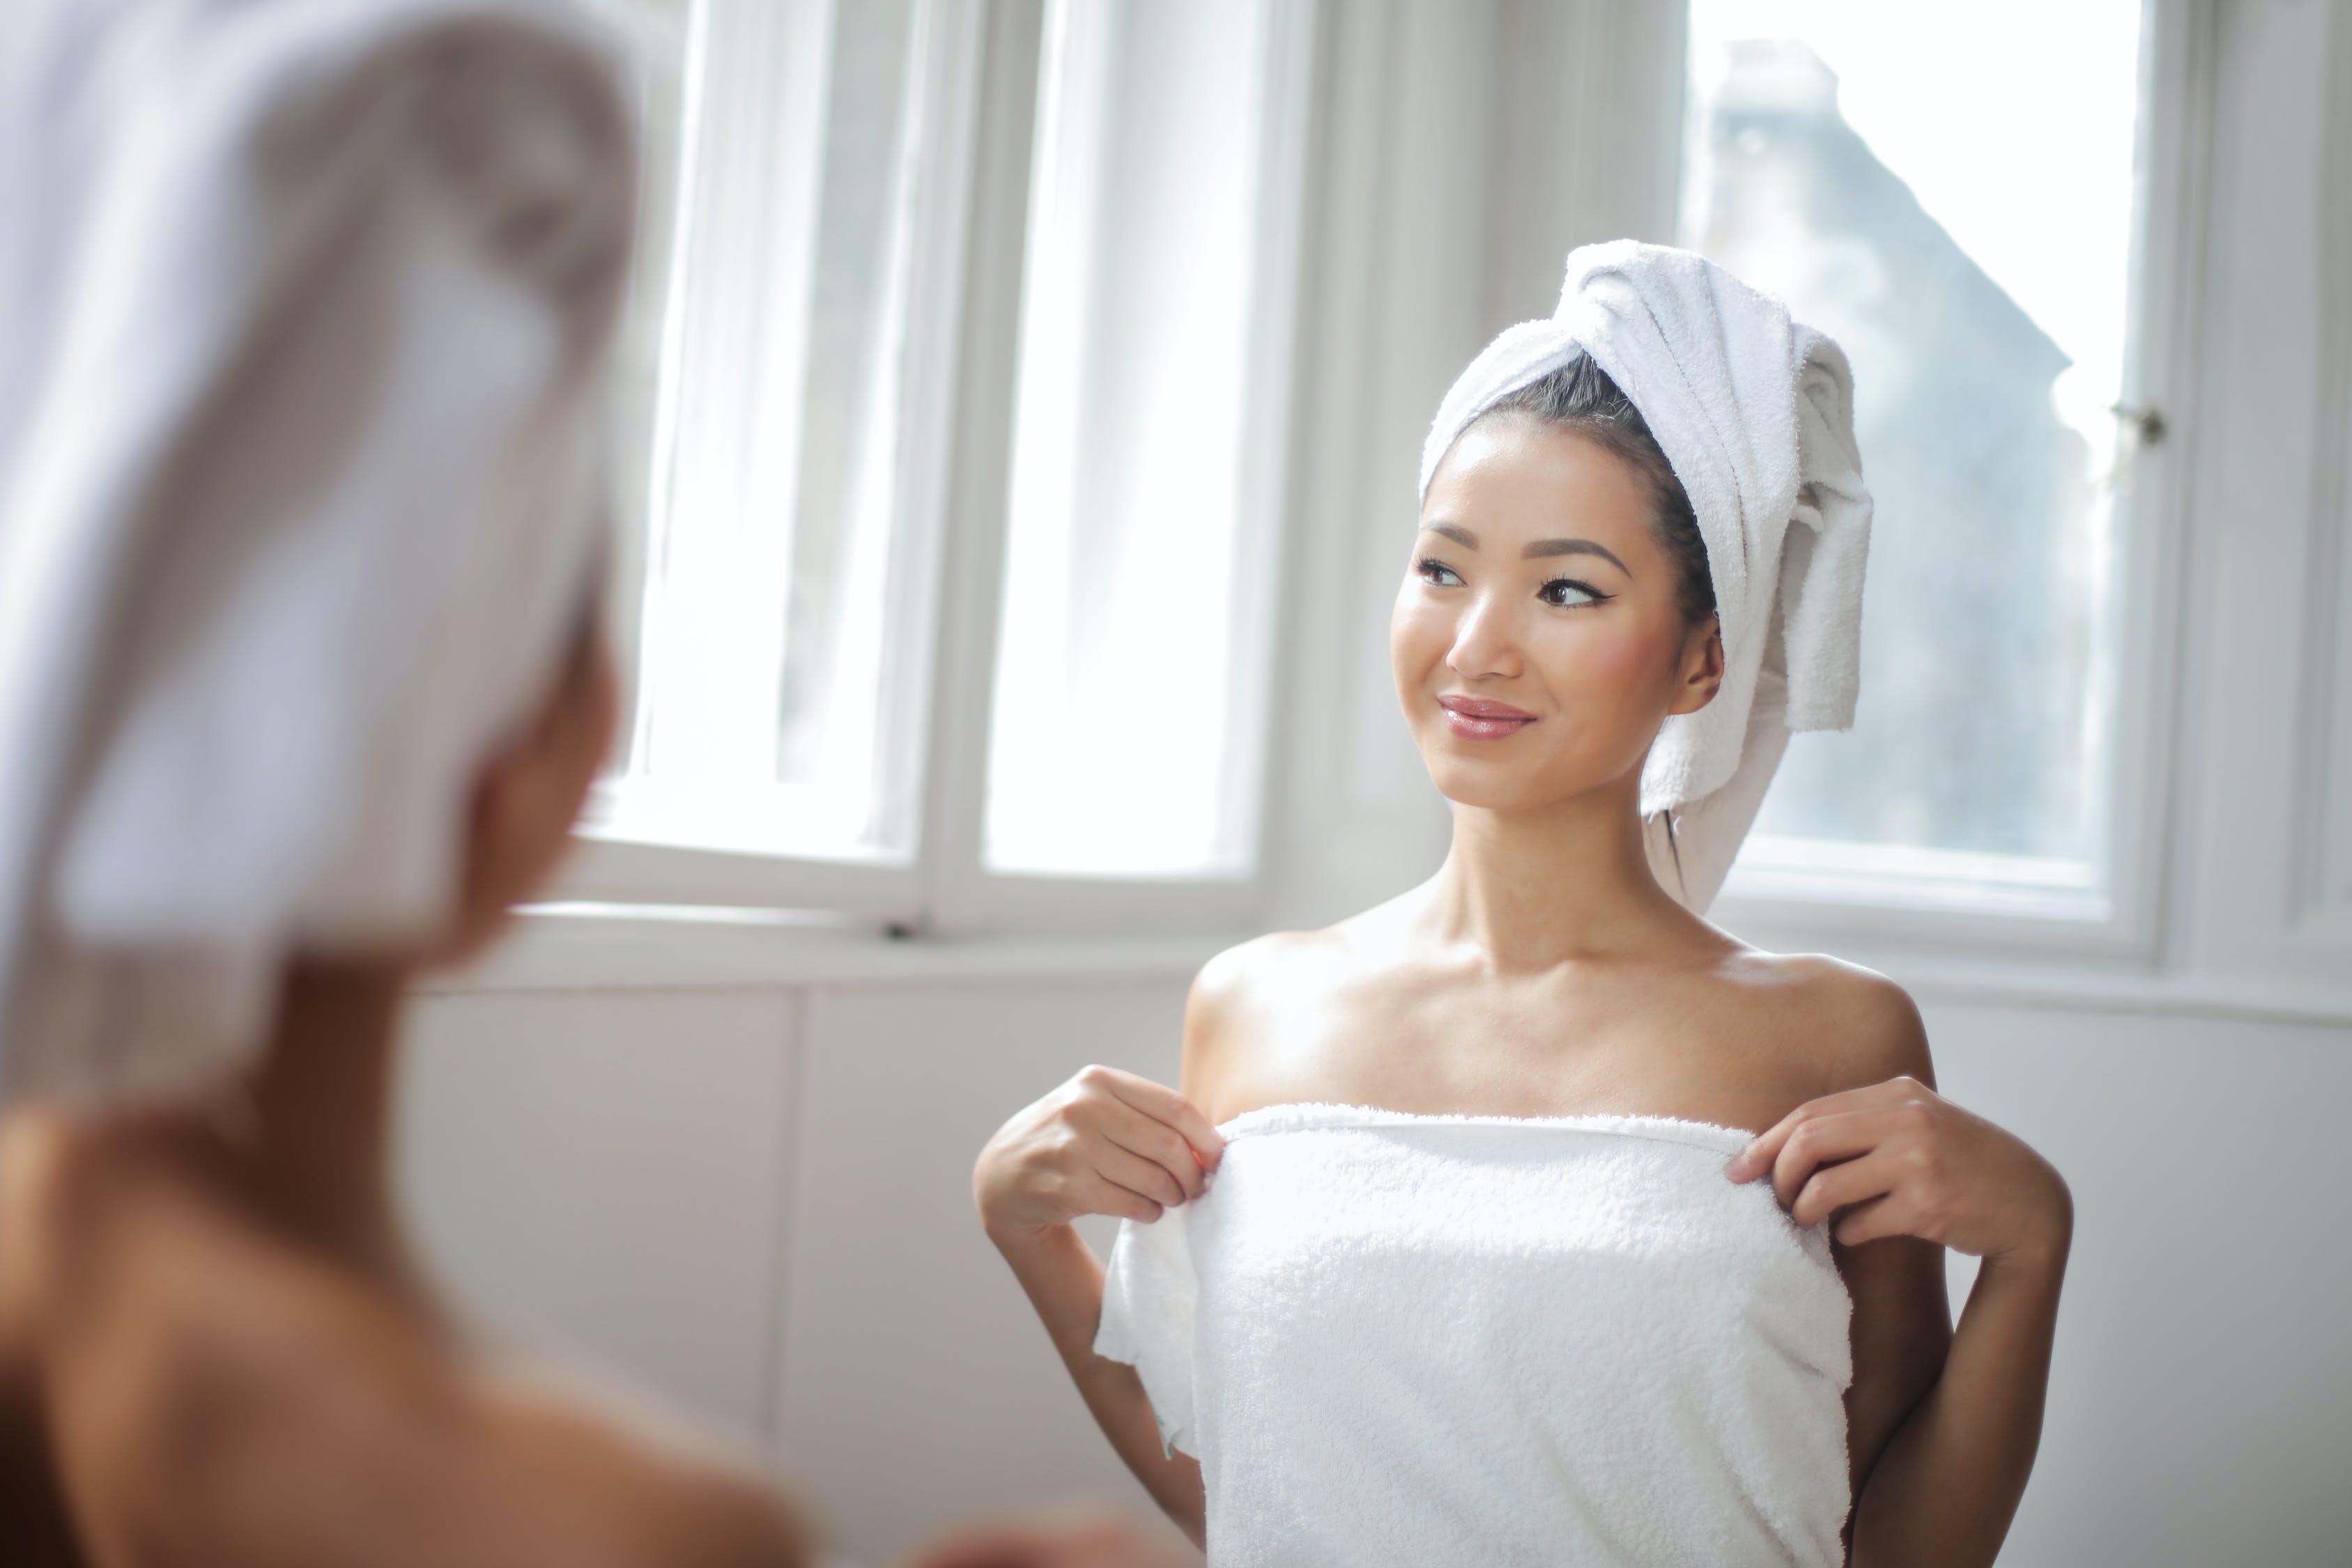 towel, woman